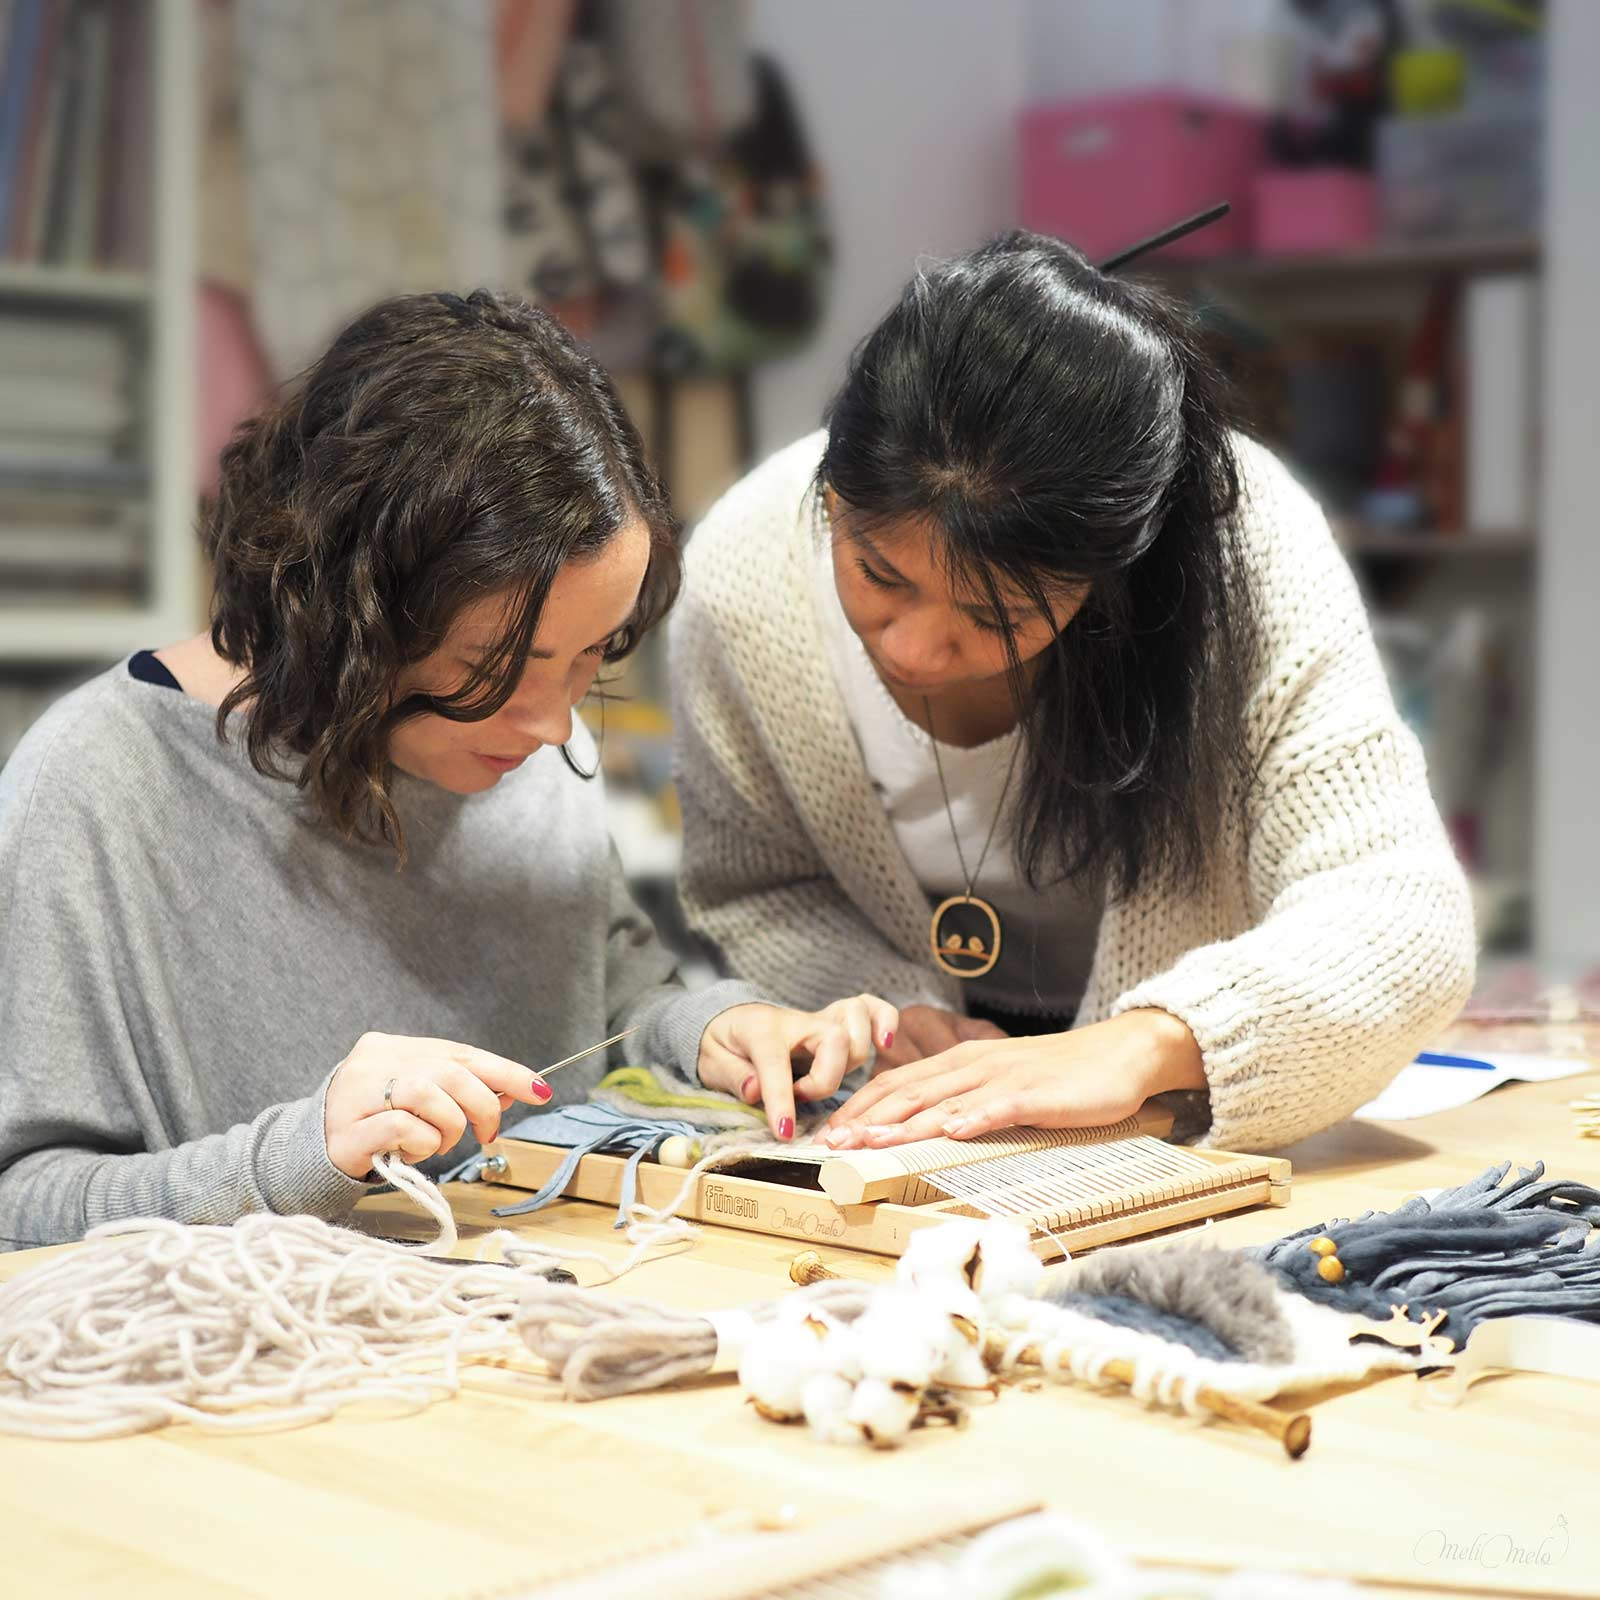 atelier de tissage MéliMélo workshop laboutiquedemelimelo wip Valladolid Mimarinita